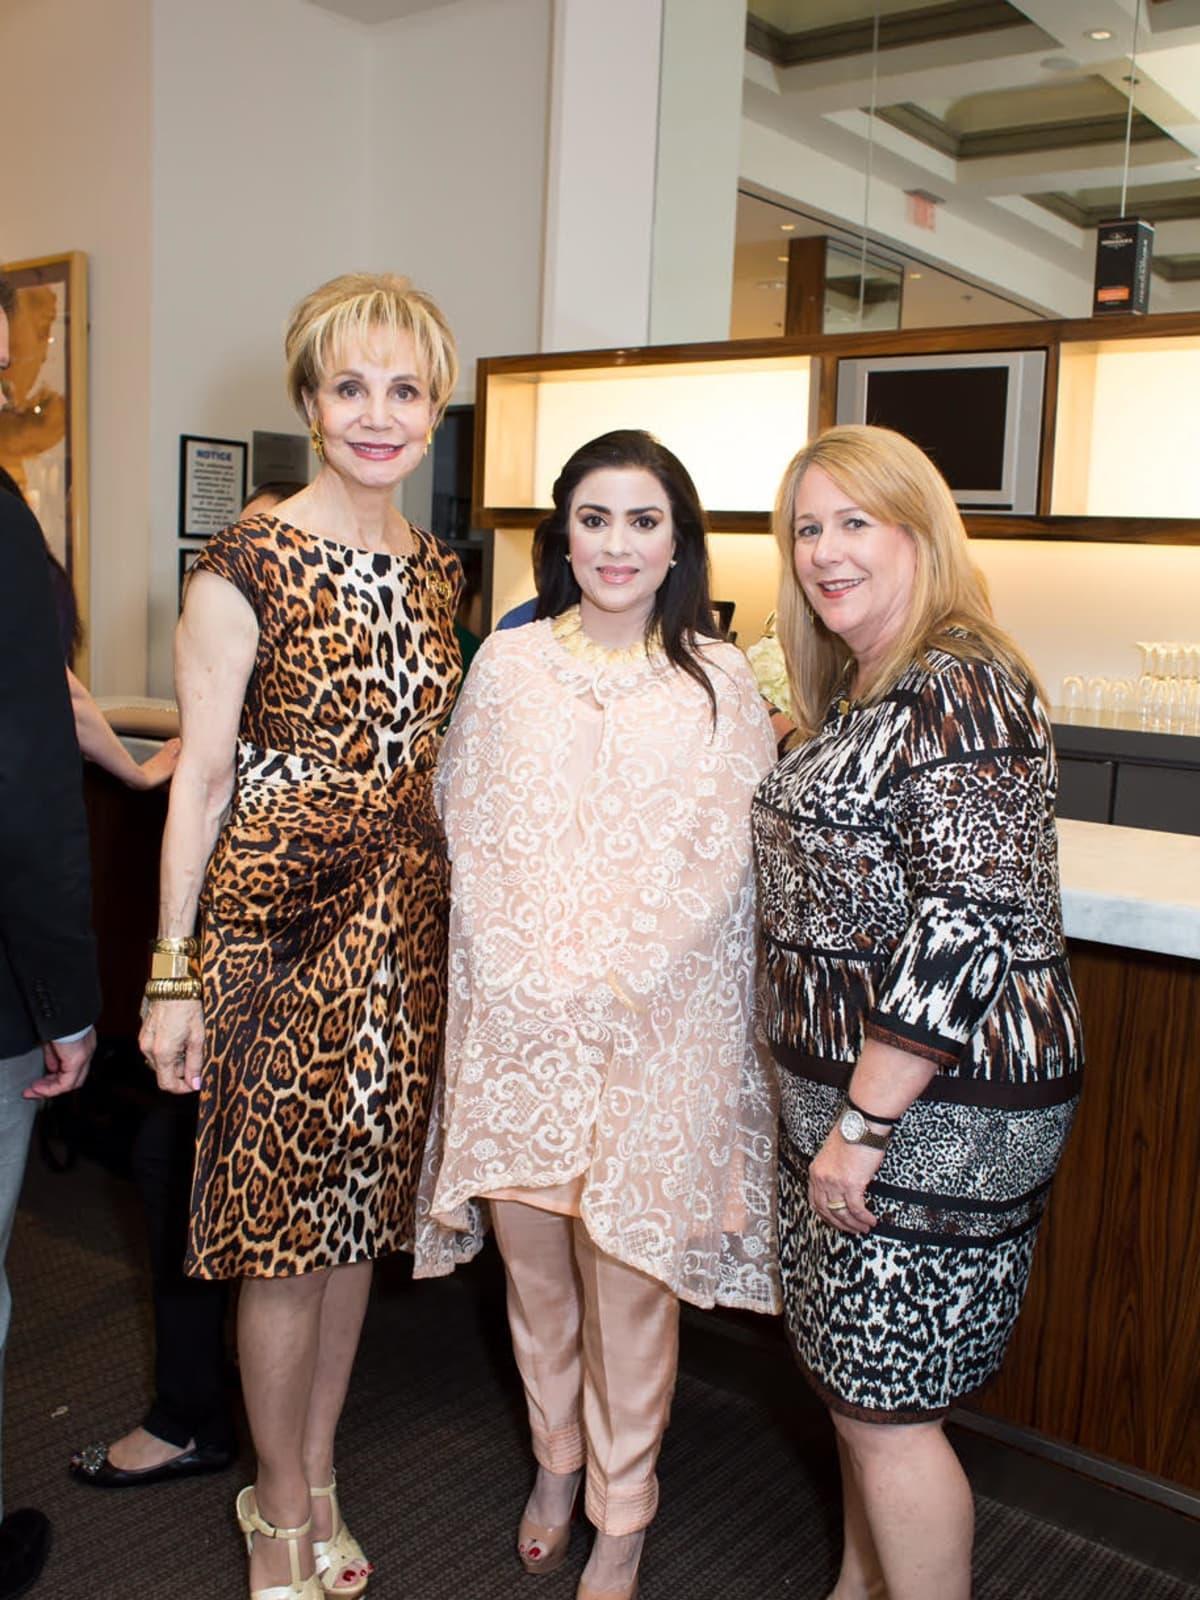 Leisa Holland Nelson, Maha Rasheed Khan, Stacey Swift at International Soiree Kickoff